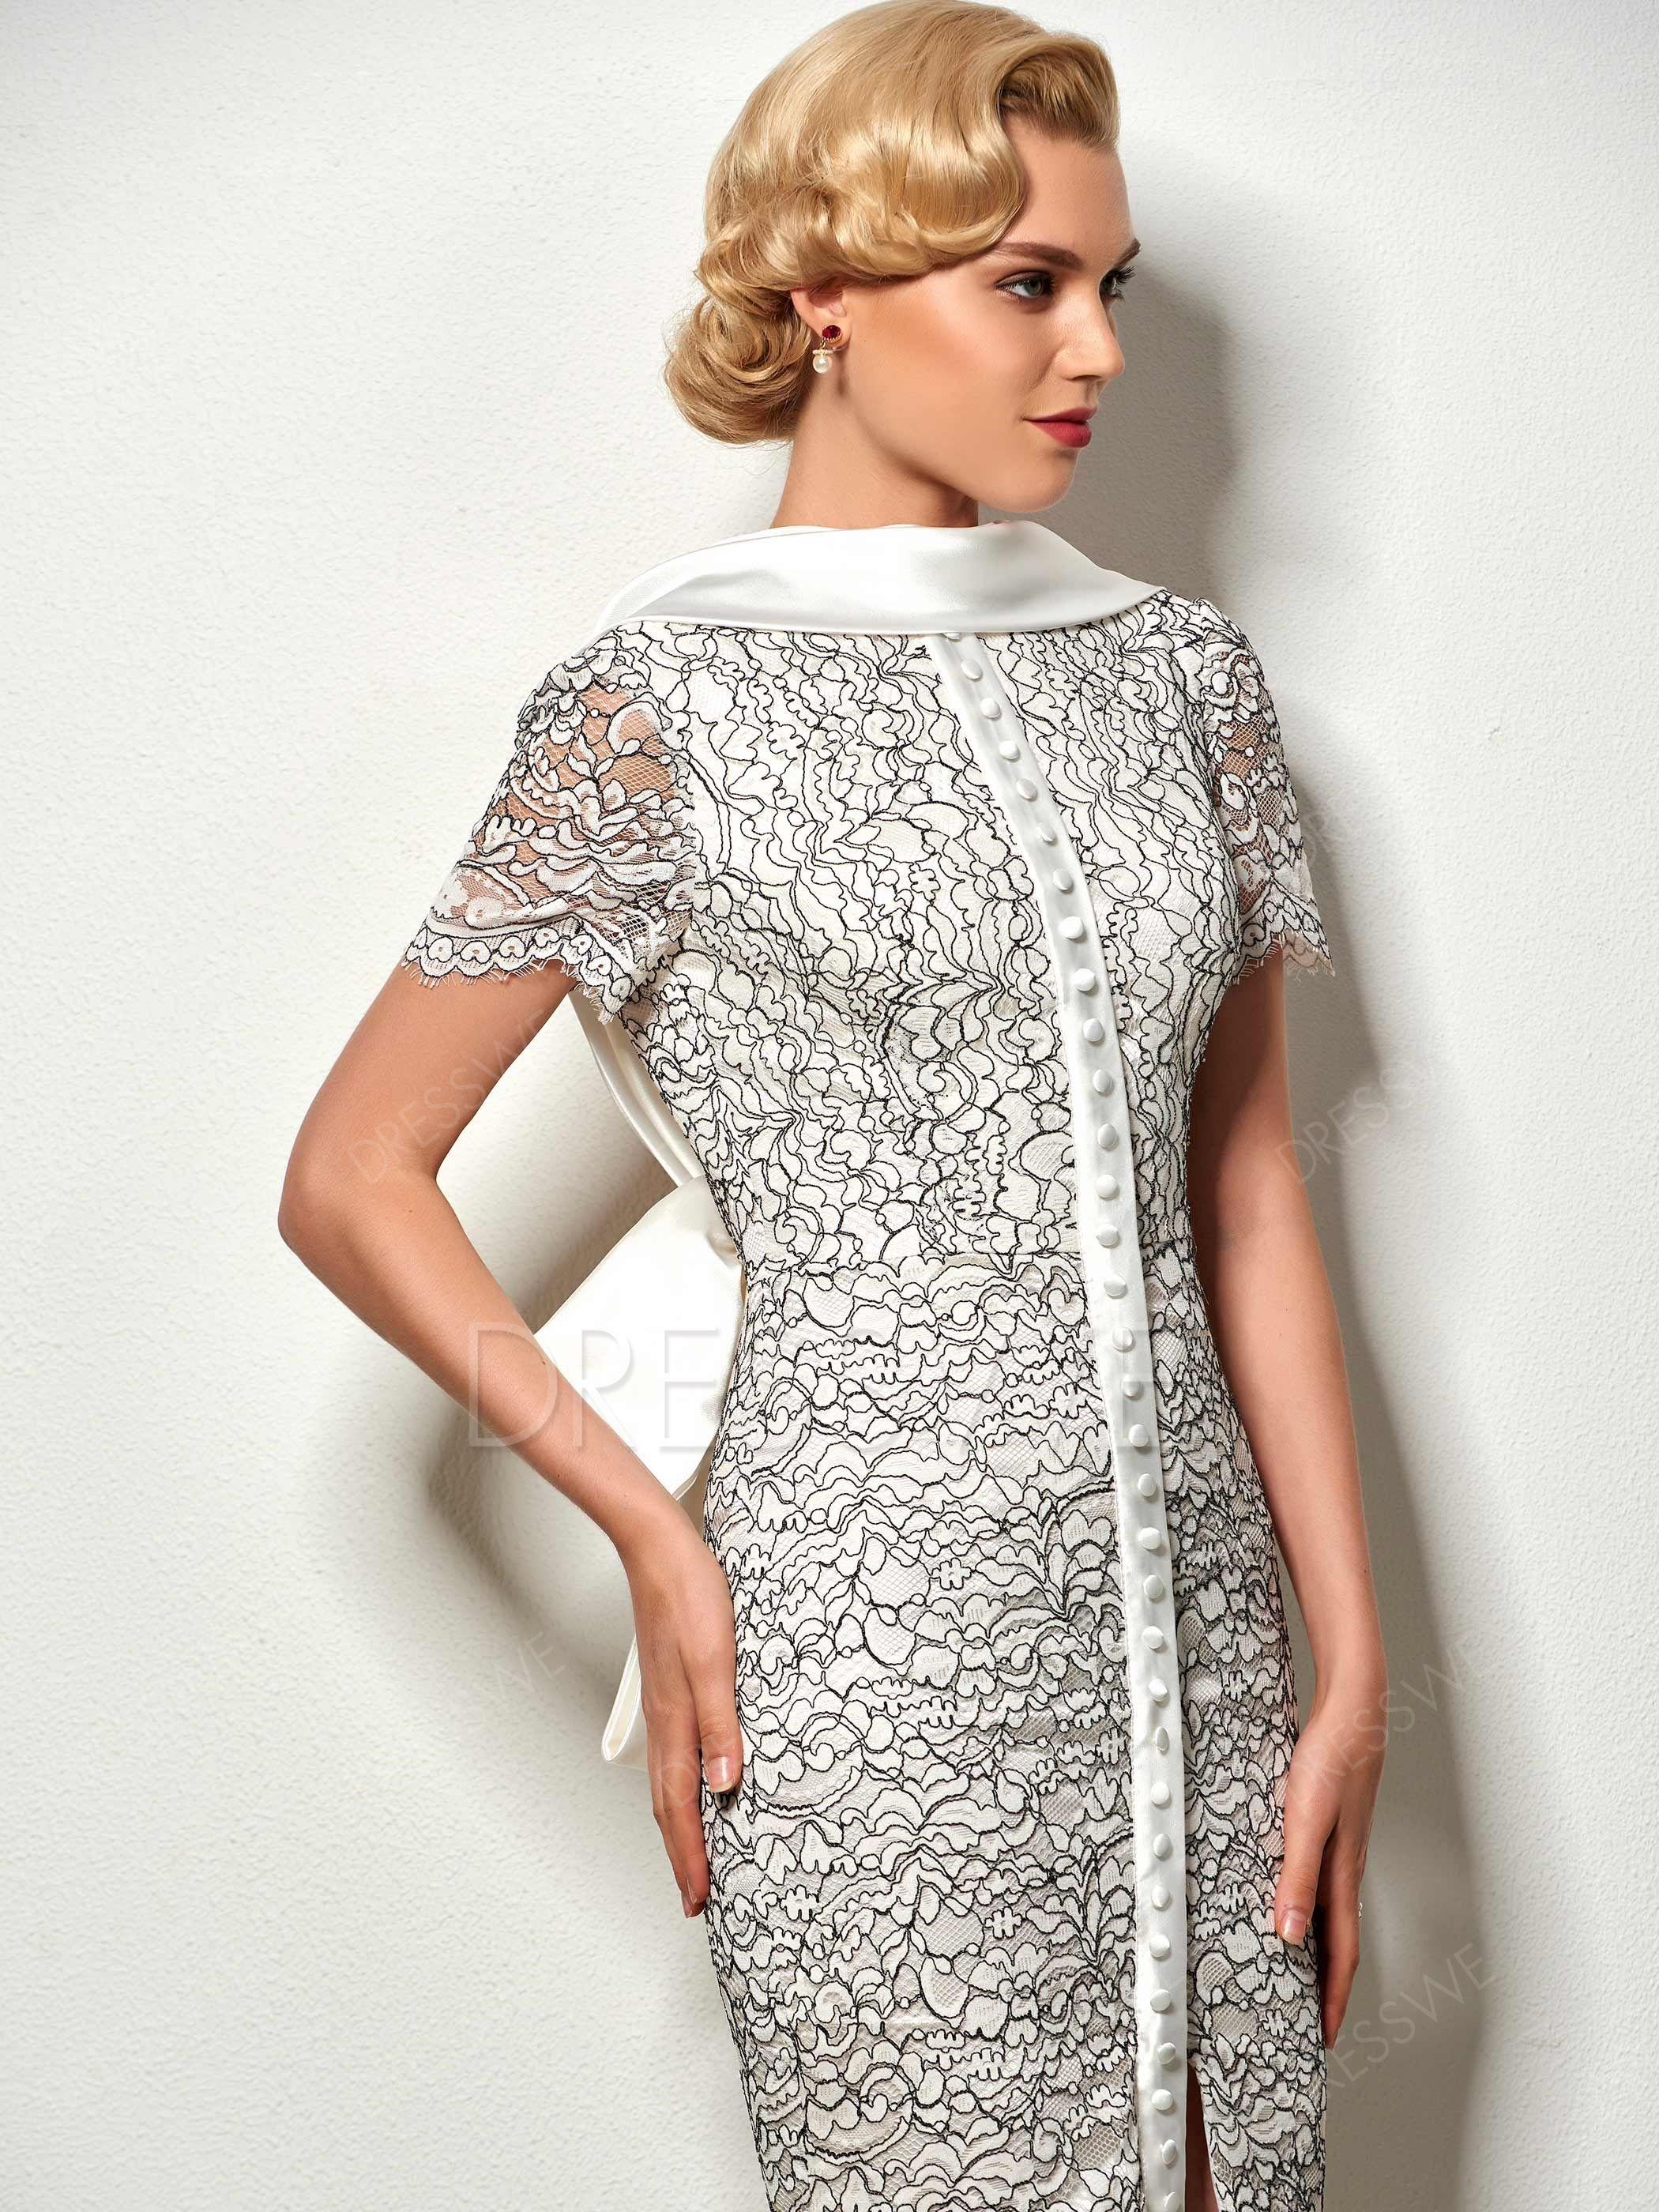 $99.99 Dresswe.com SUPPLIES Vintage Sheath Short Sleeve Lace Backless Knee Length Cocktail Dress #backlesscocktaildress